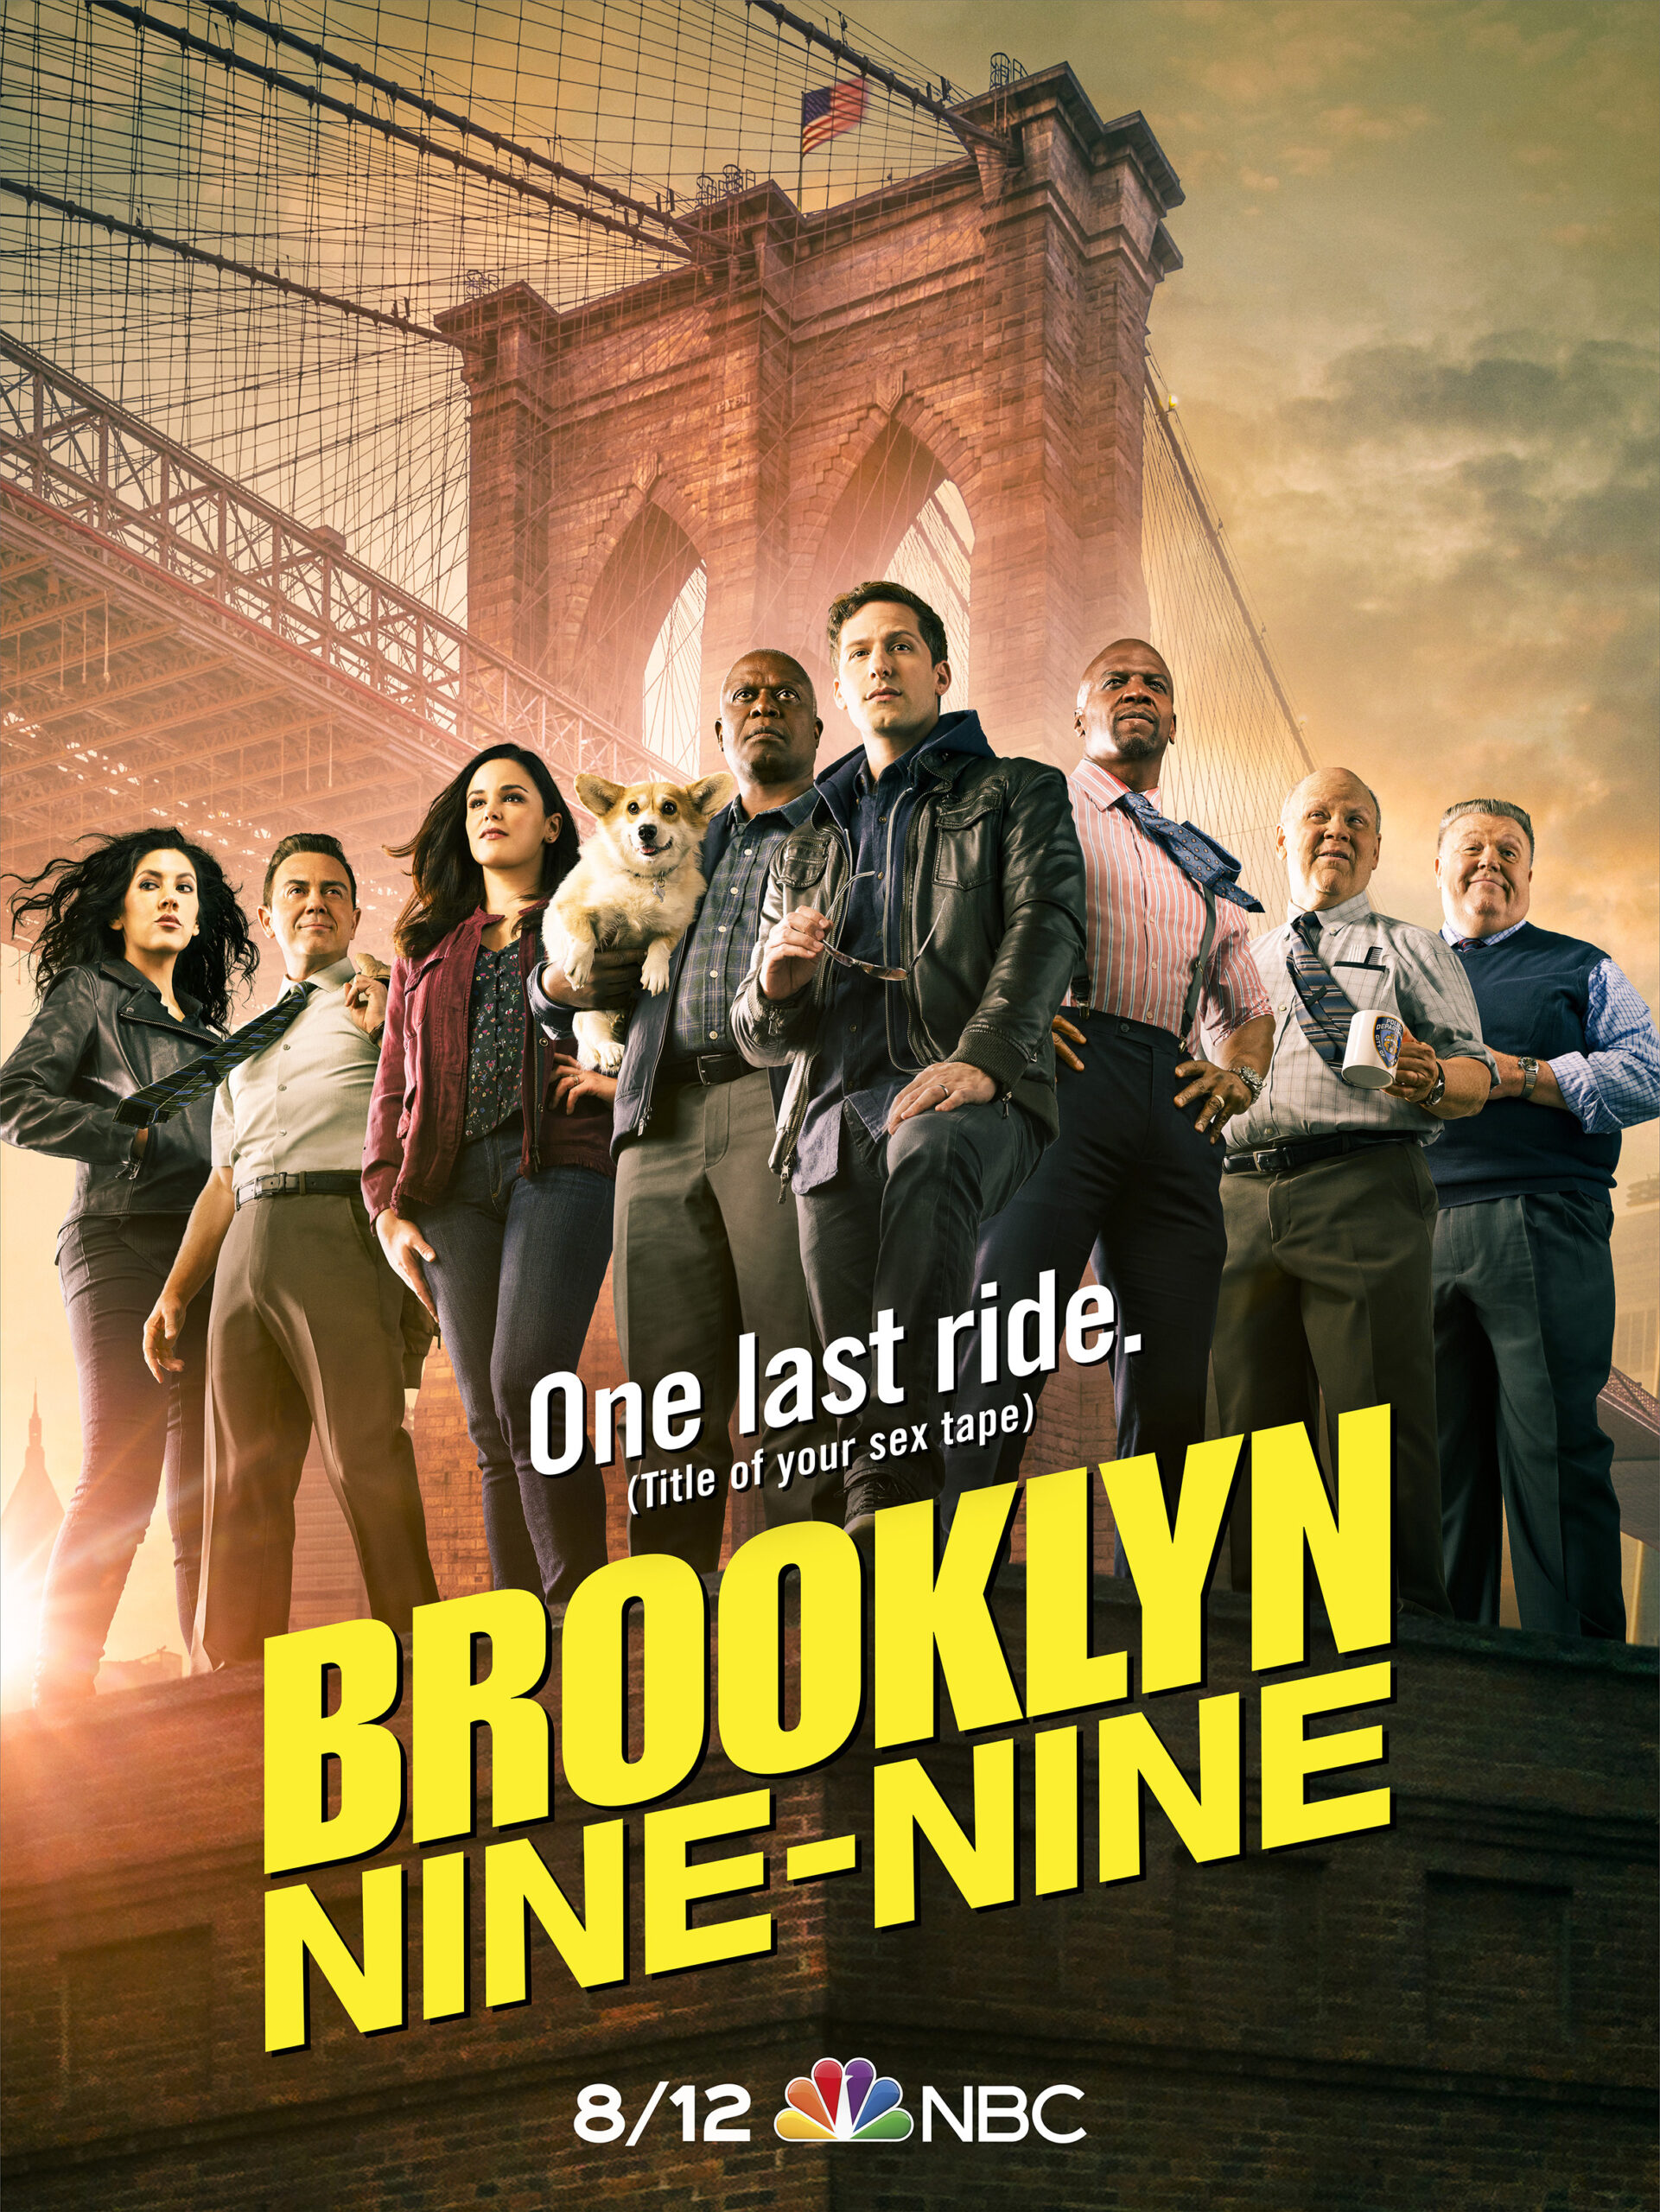 brooklyn nine-nine trailer